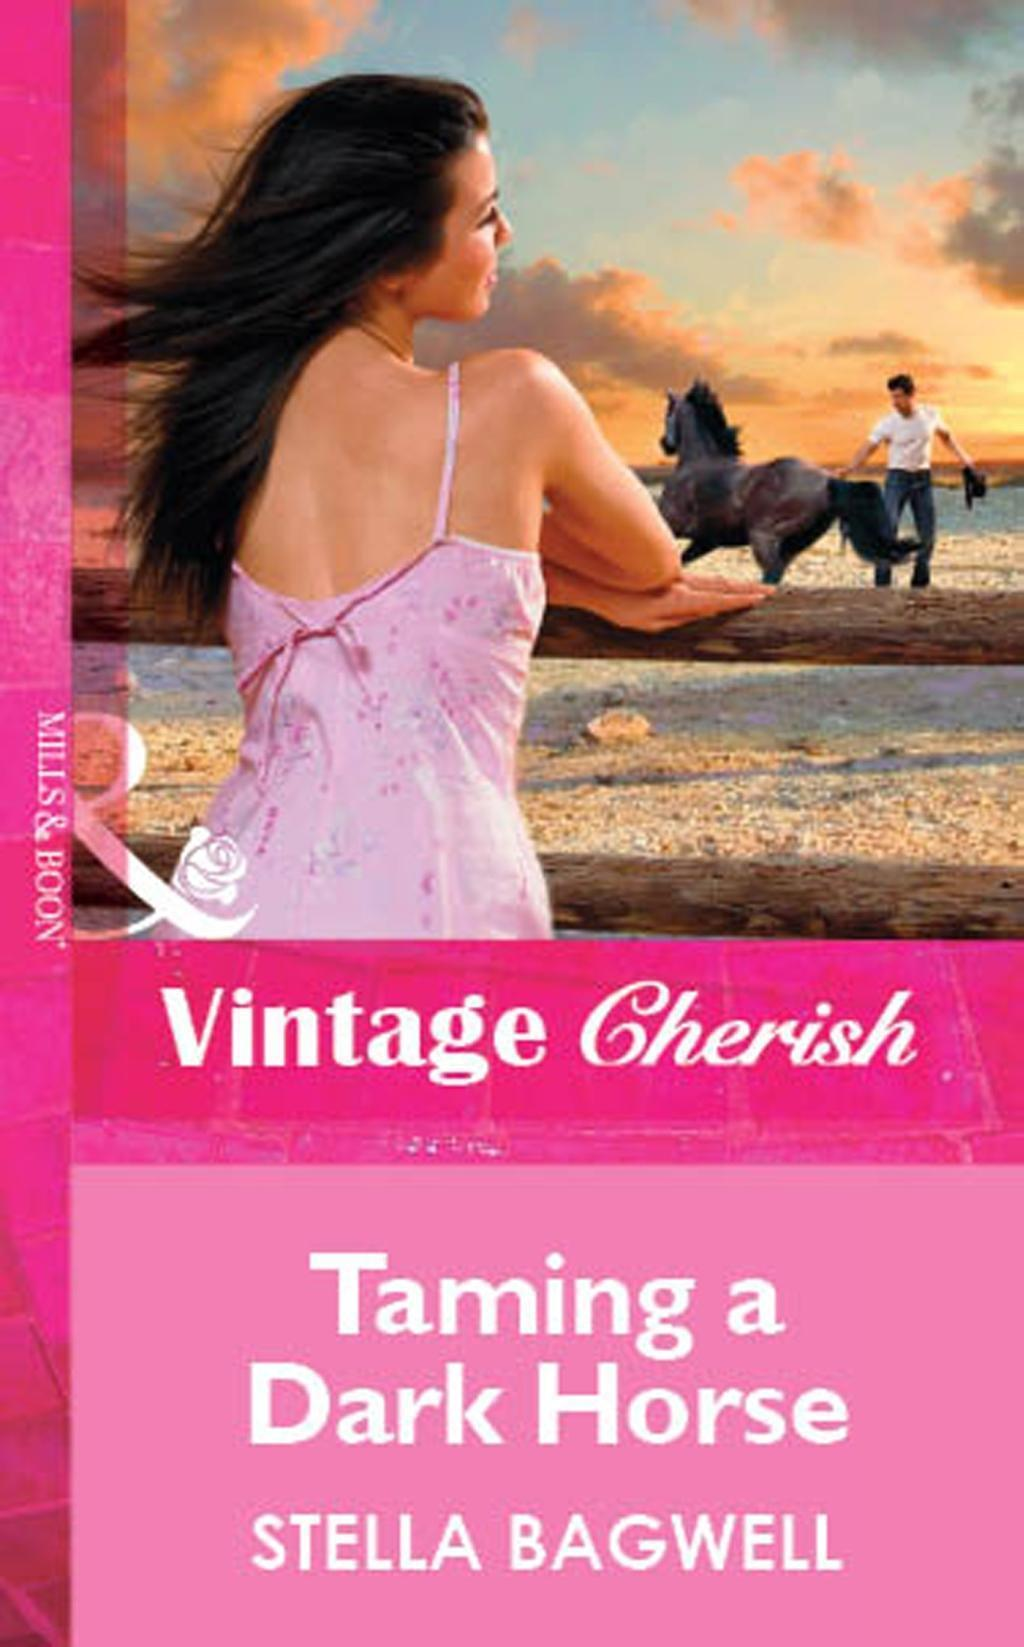 Taming a Dark Horse (Mills & Boon Vintage Cherish)